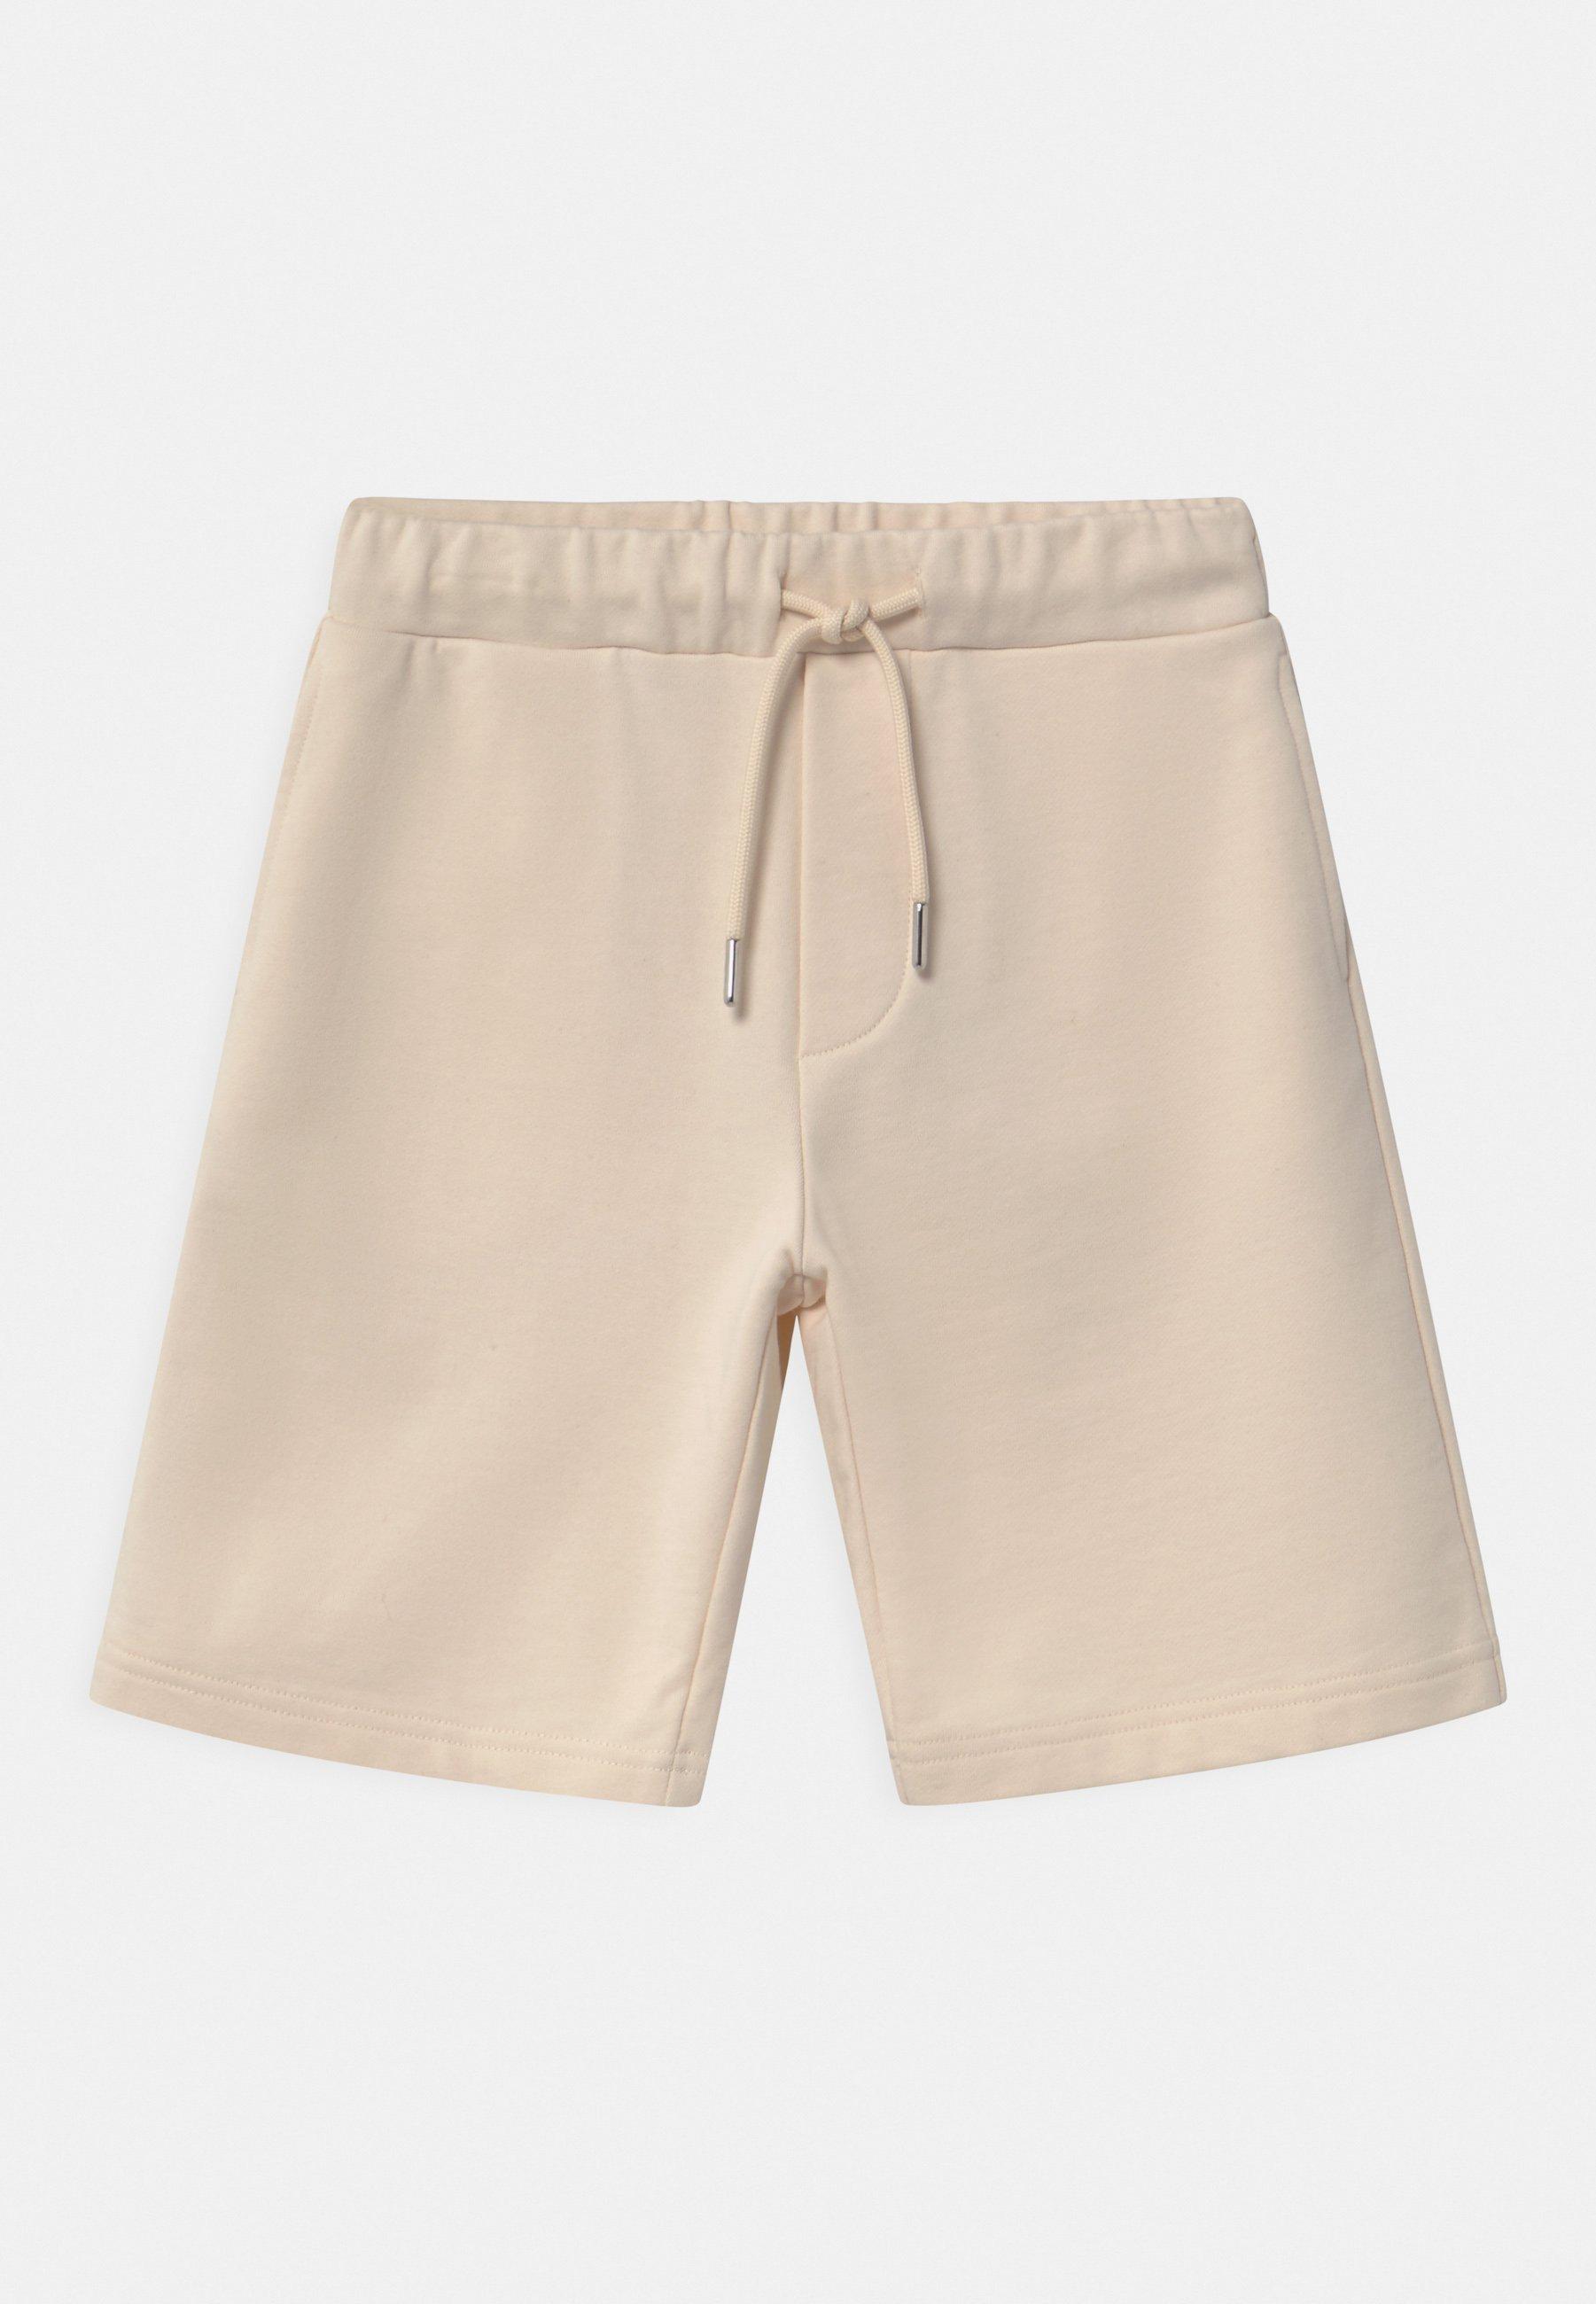 Kids CALZONCINI UNISEX - Shorts